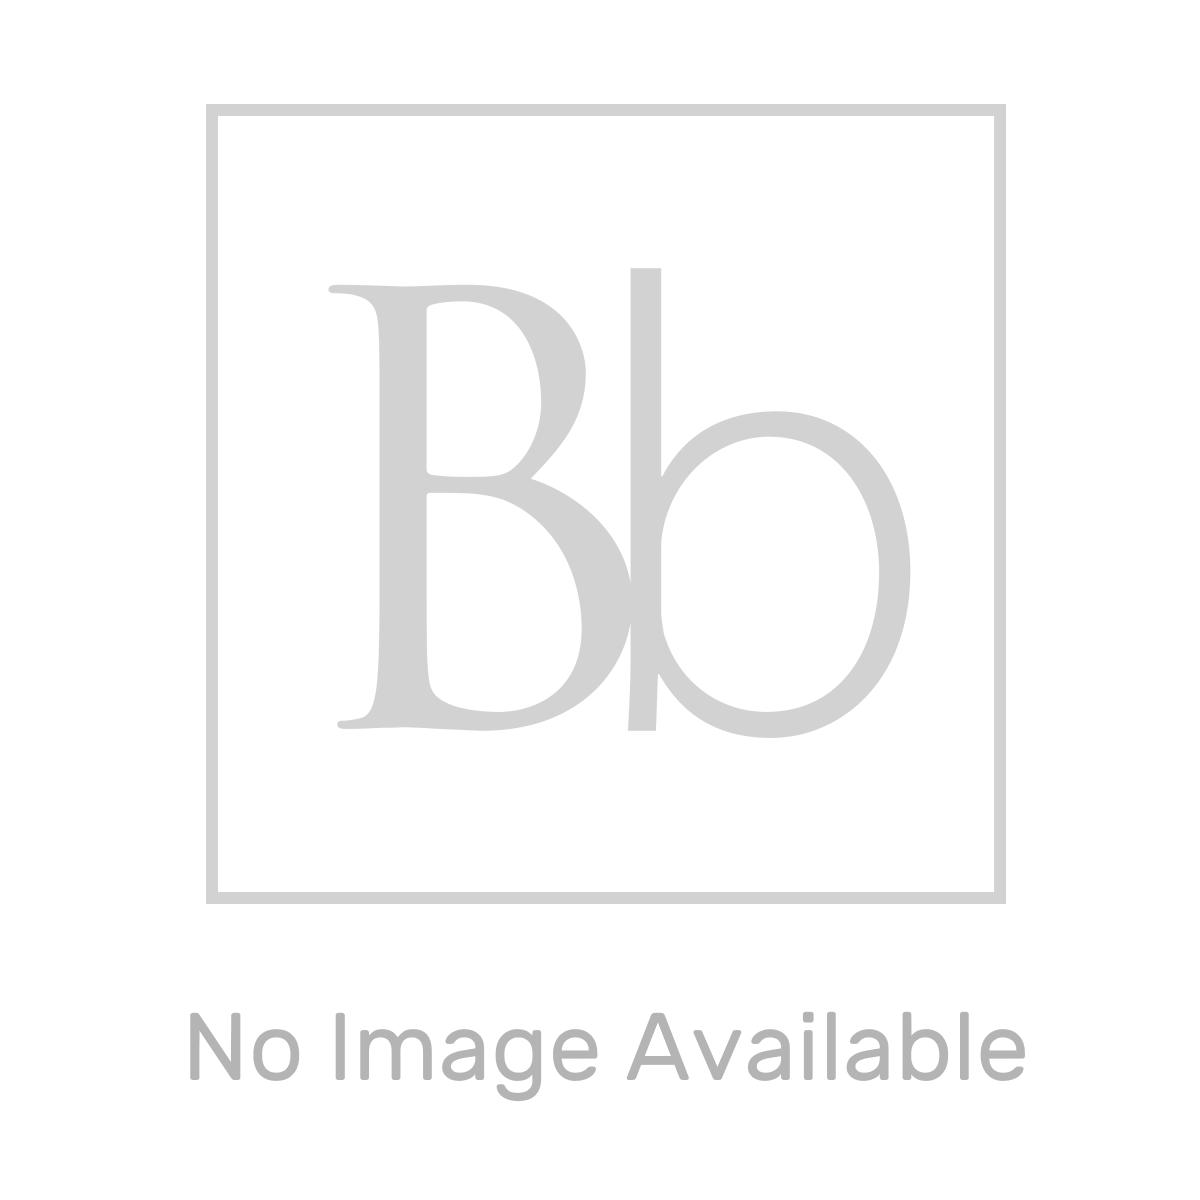 RAK Feeling White Rectangular Shower Tray 1200 x 900mm Measurements